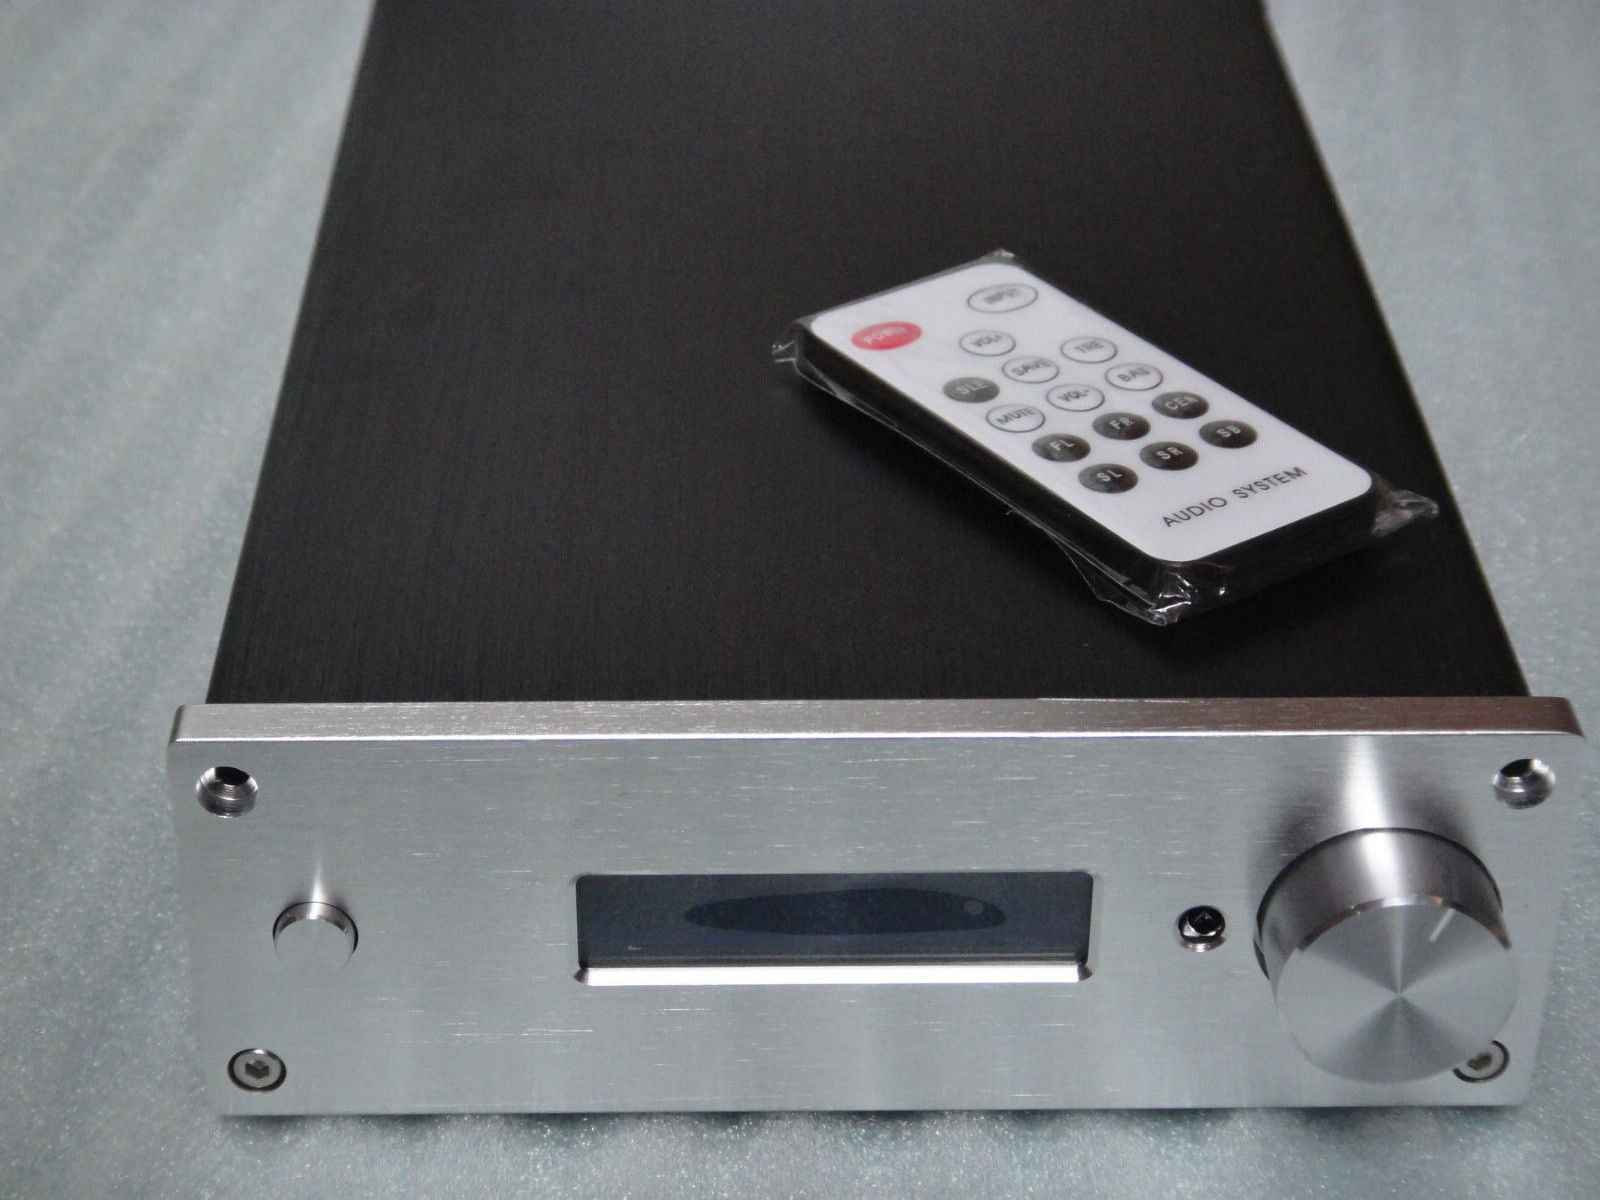 New Version PGA2310 Stero Remote Volume Controller Preamplifier Built In Case